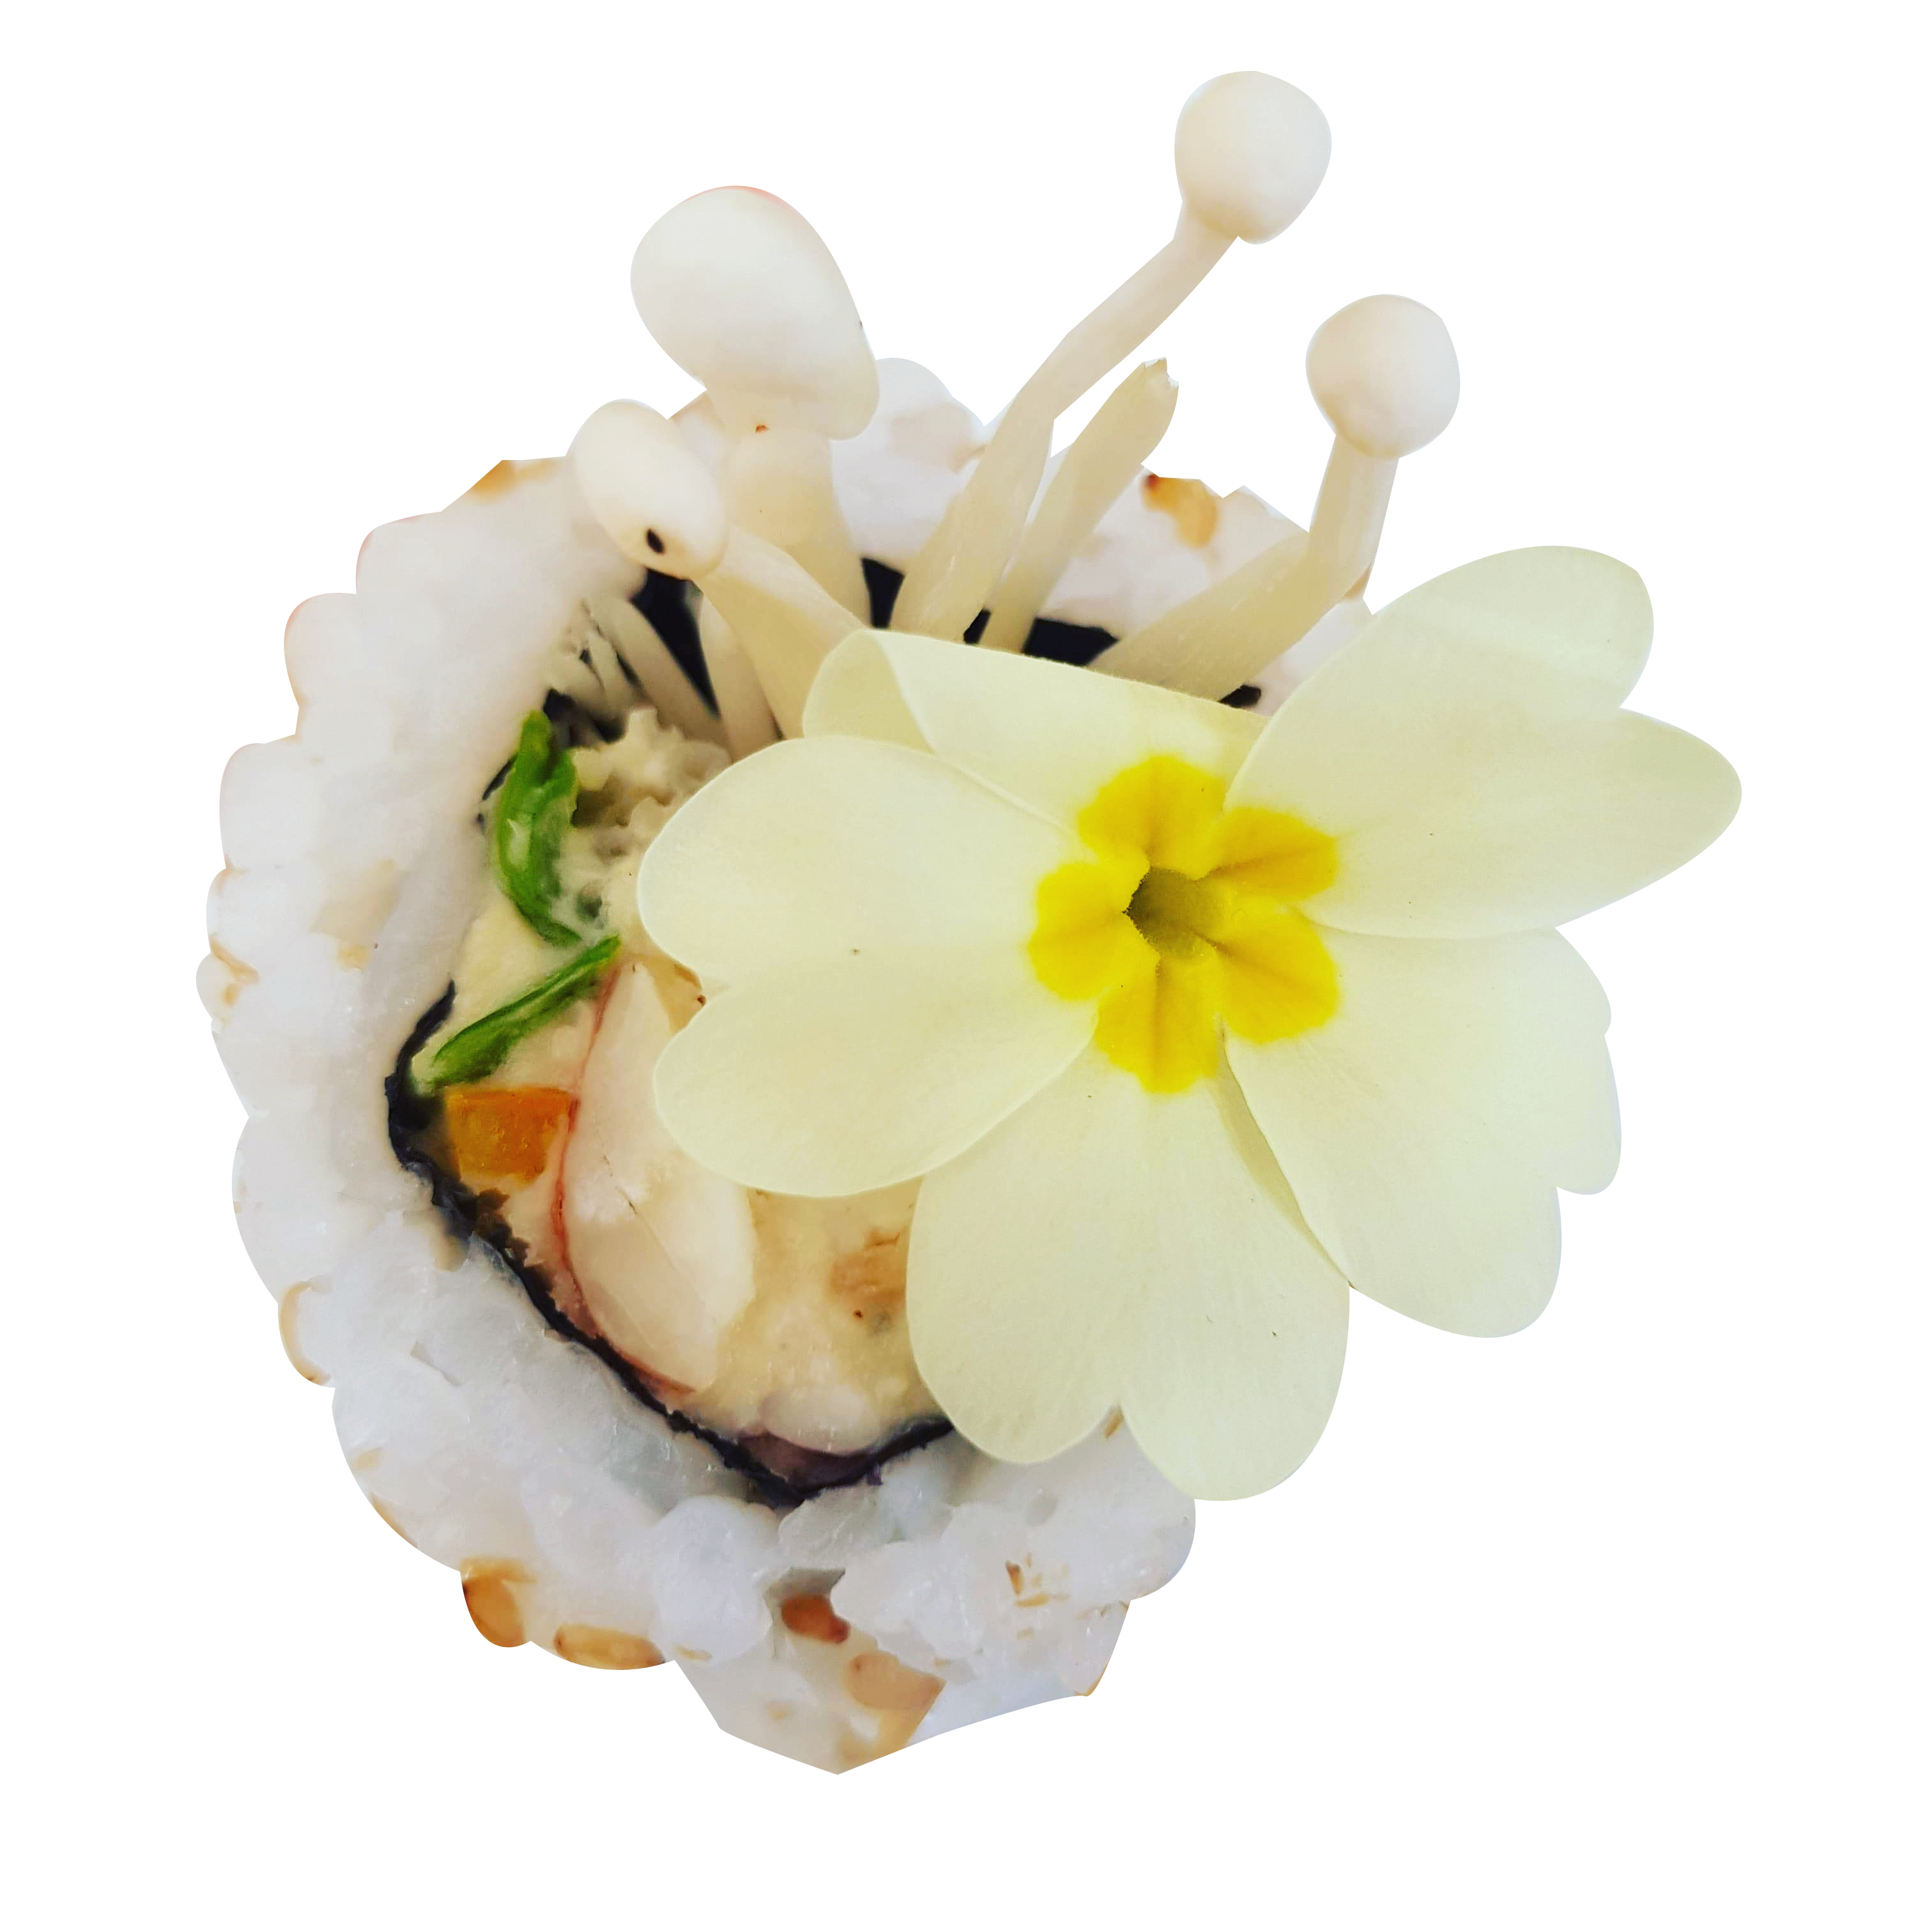 YUZU VEGE ARTISAN SUSHIS flower